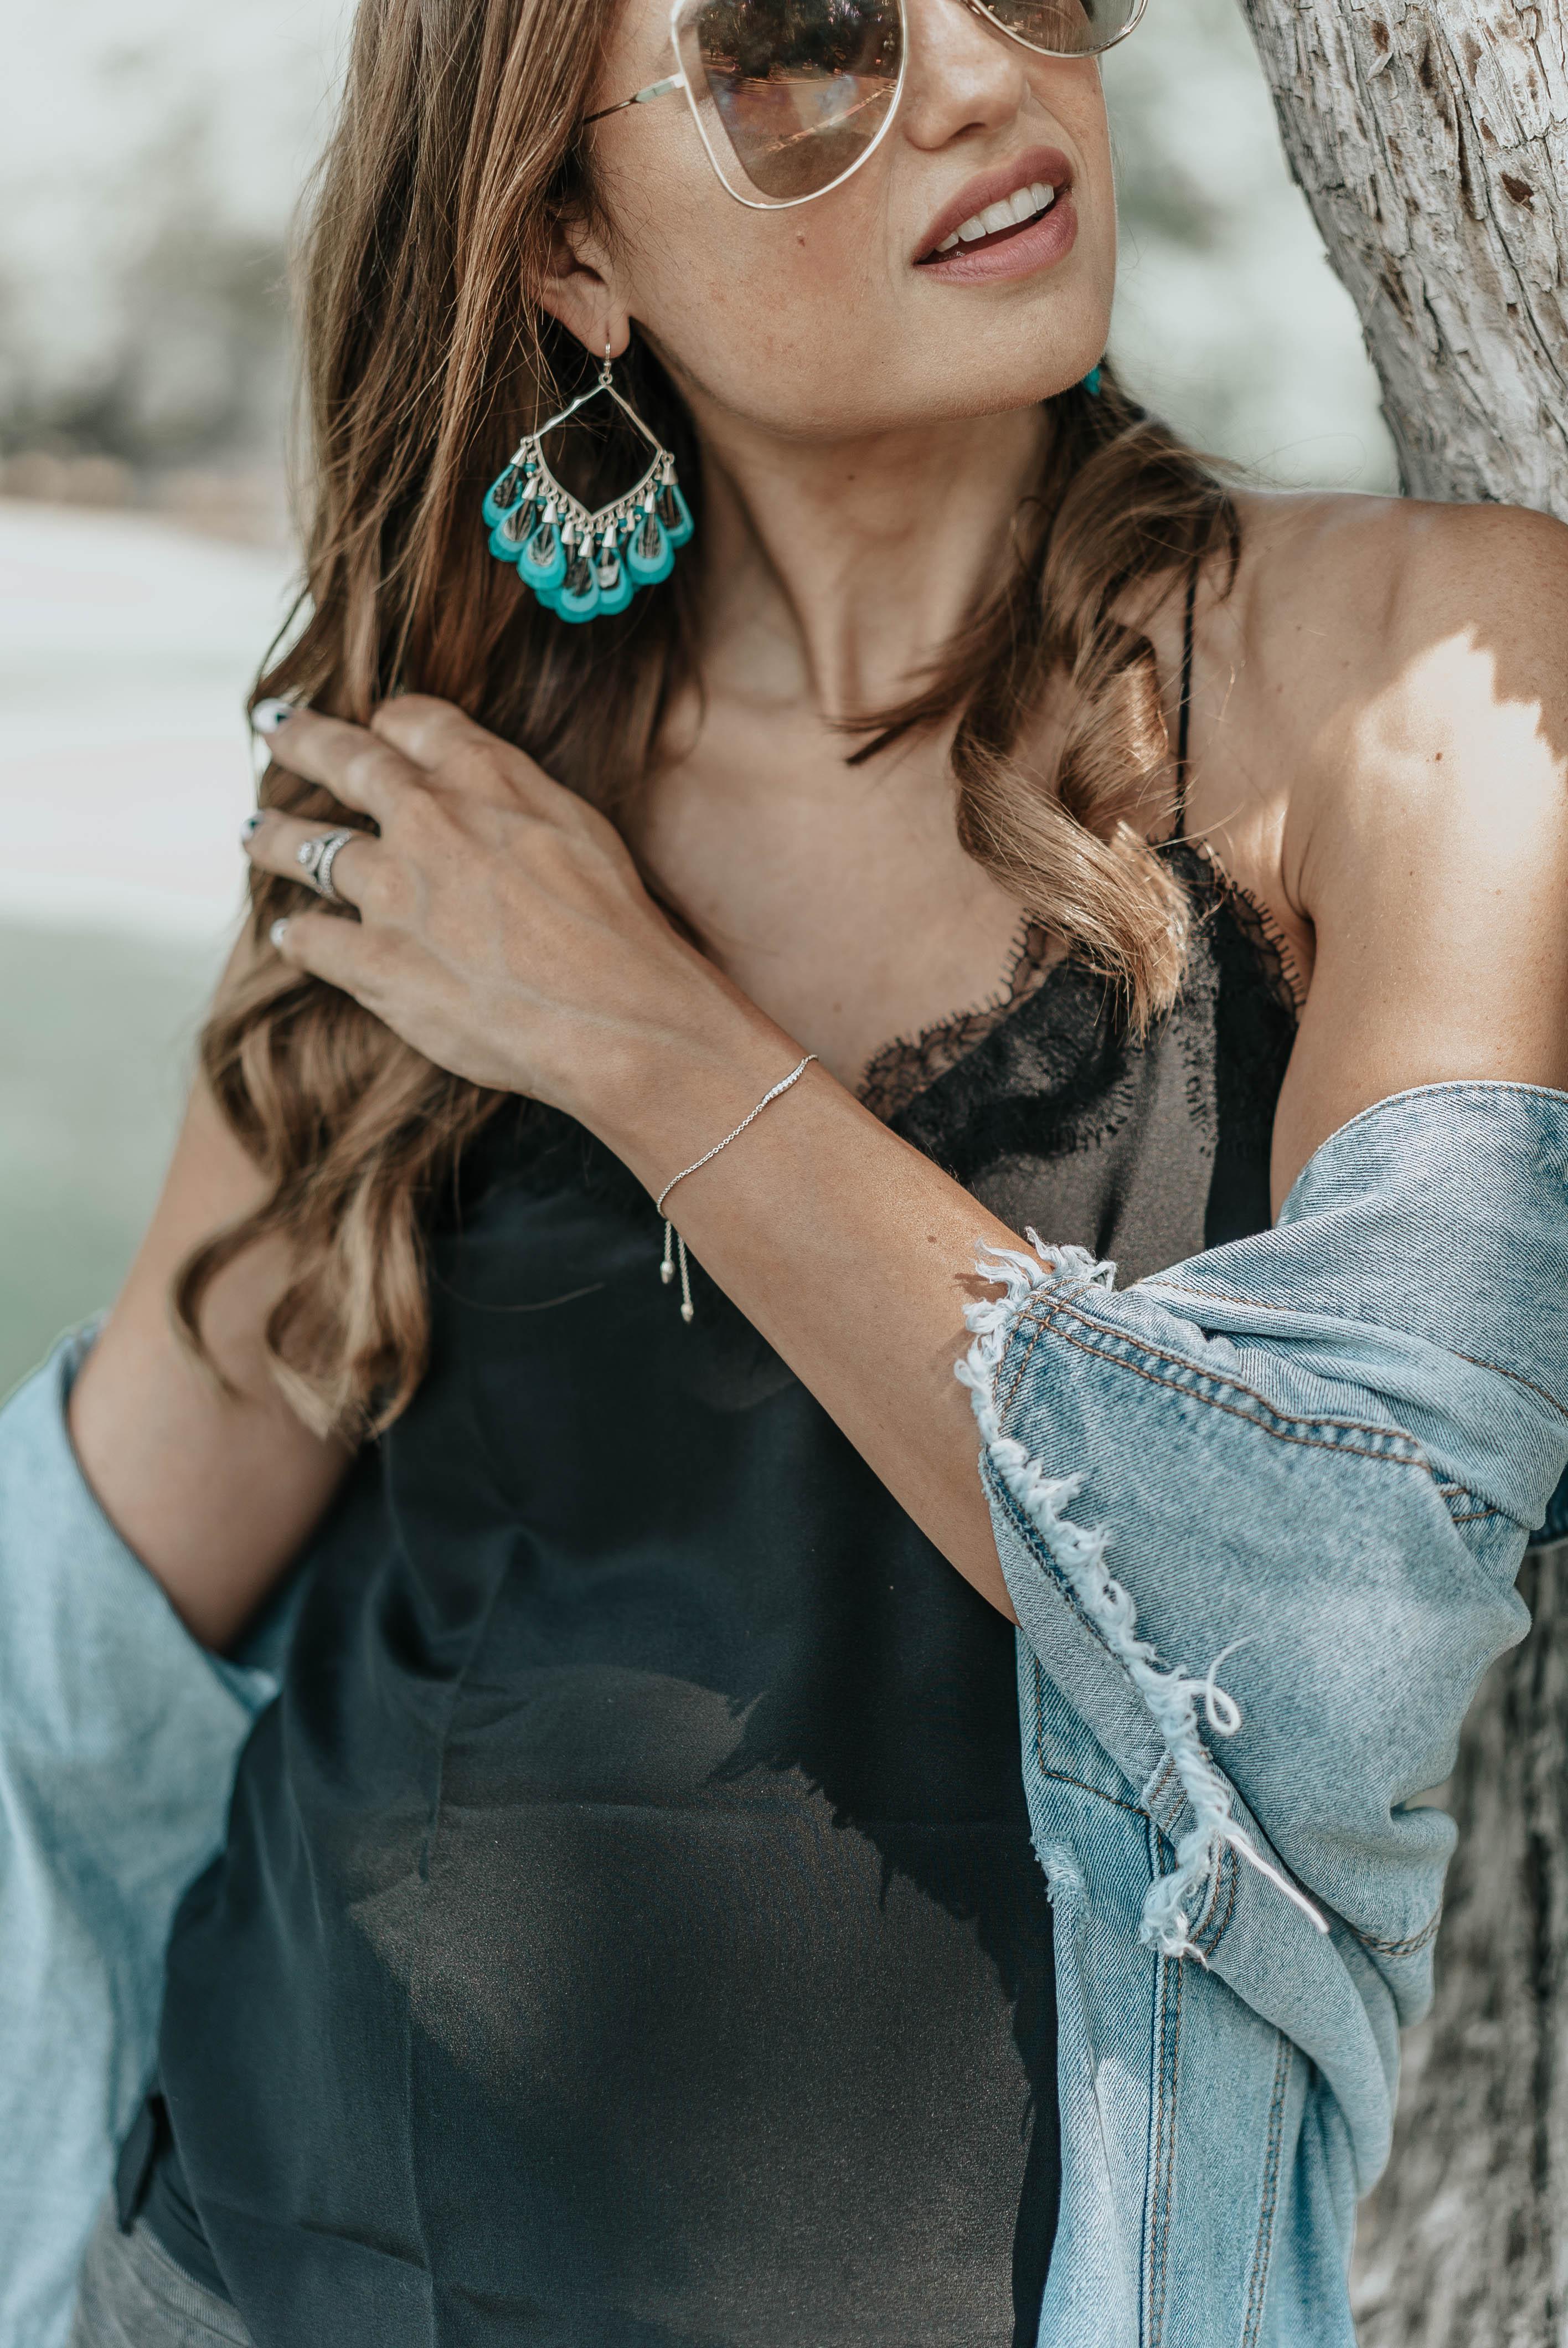 KSjewelry1 1 - Four Methods to Improve your Wardrobe utilizing Items You already Personal